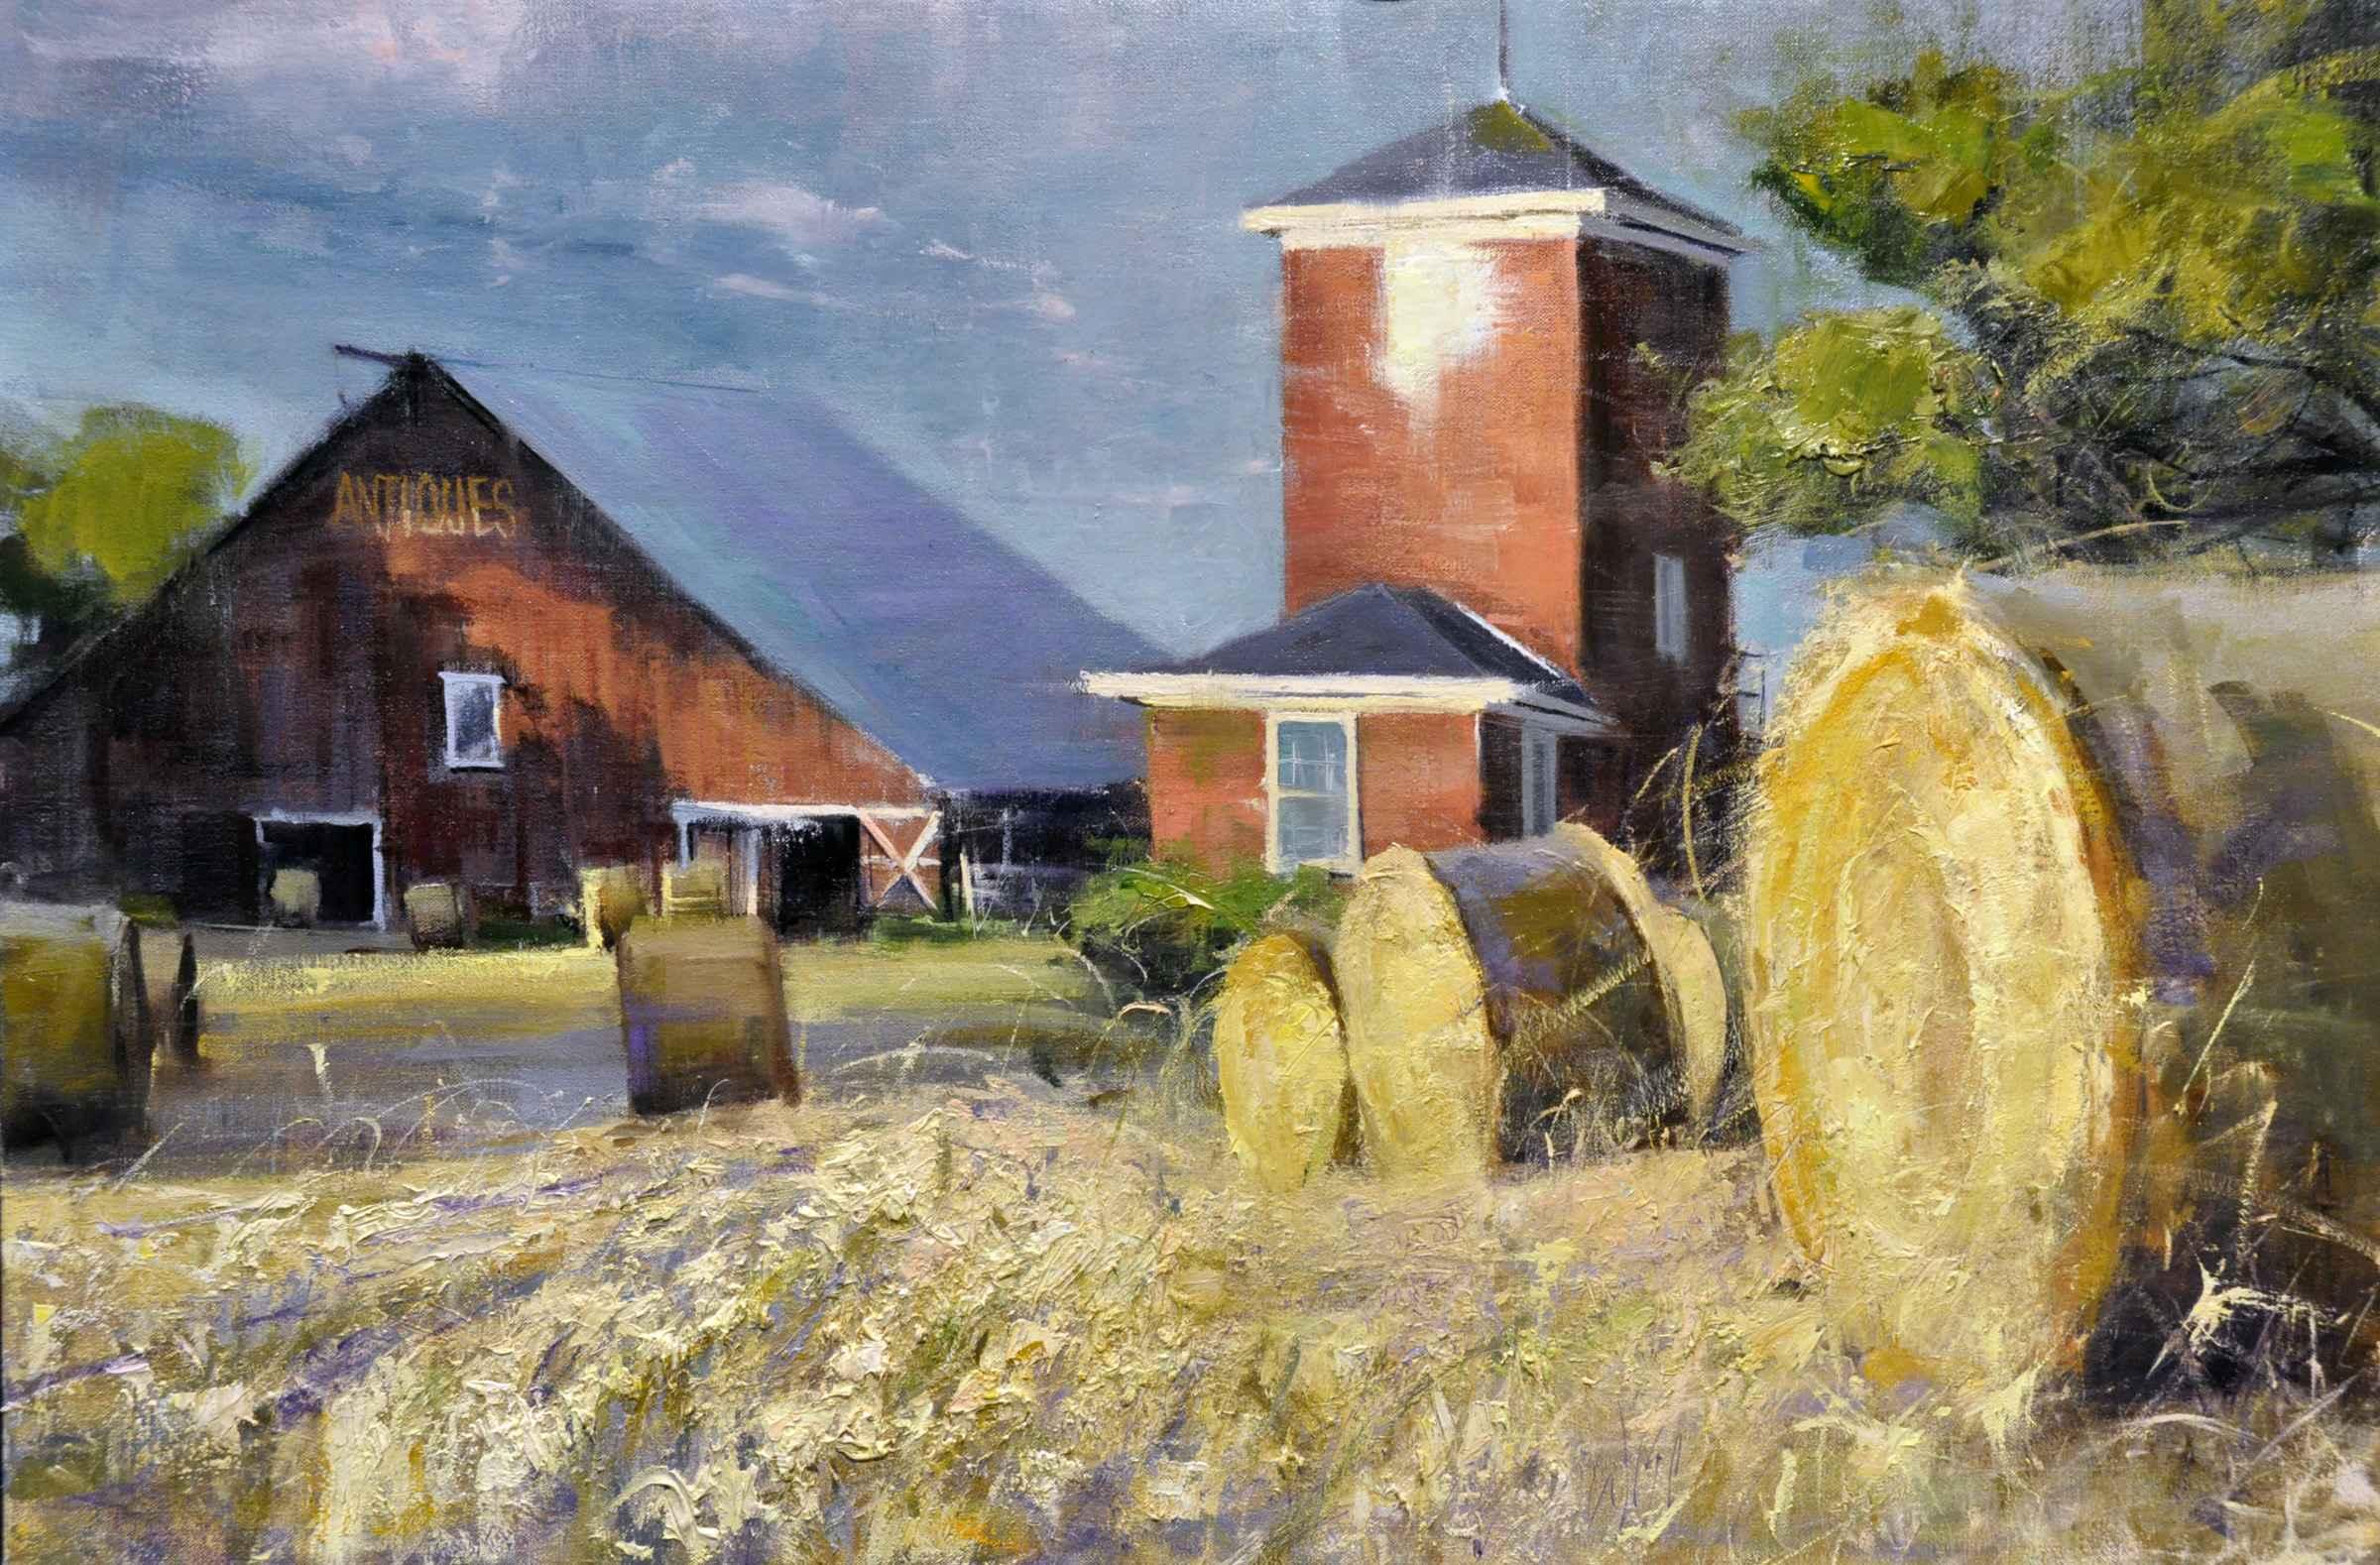 Salmagundi Farm II by  Mike Wise - Masterpiece Online